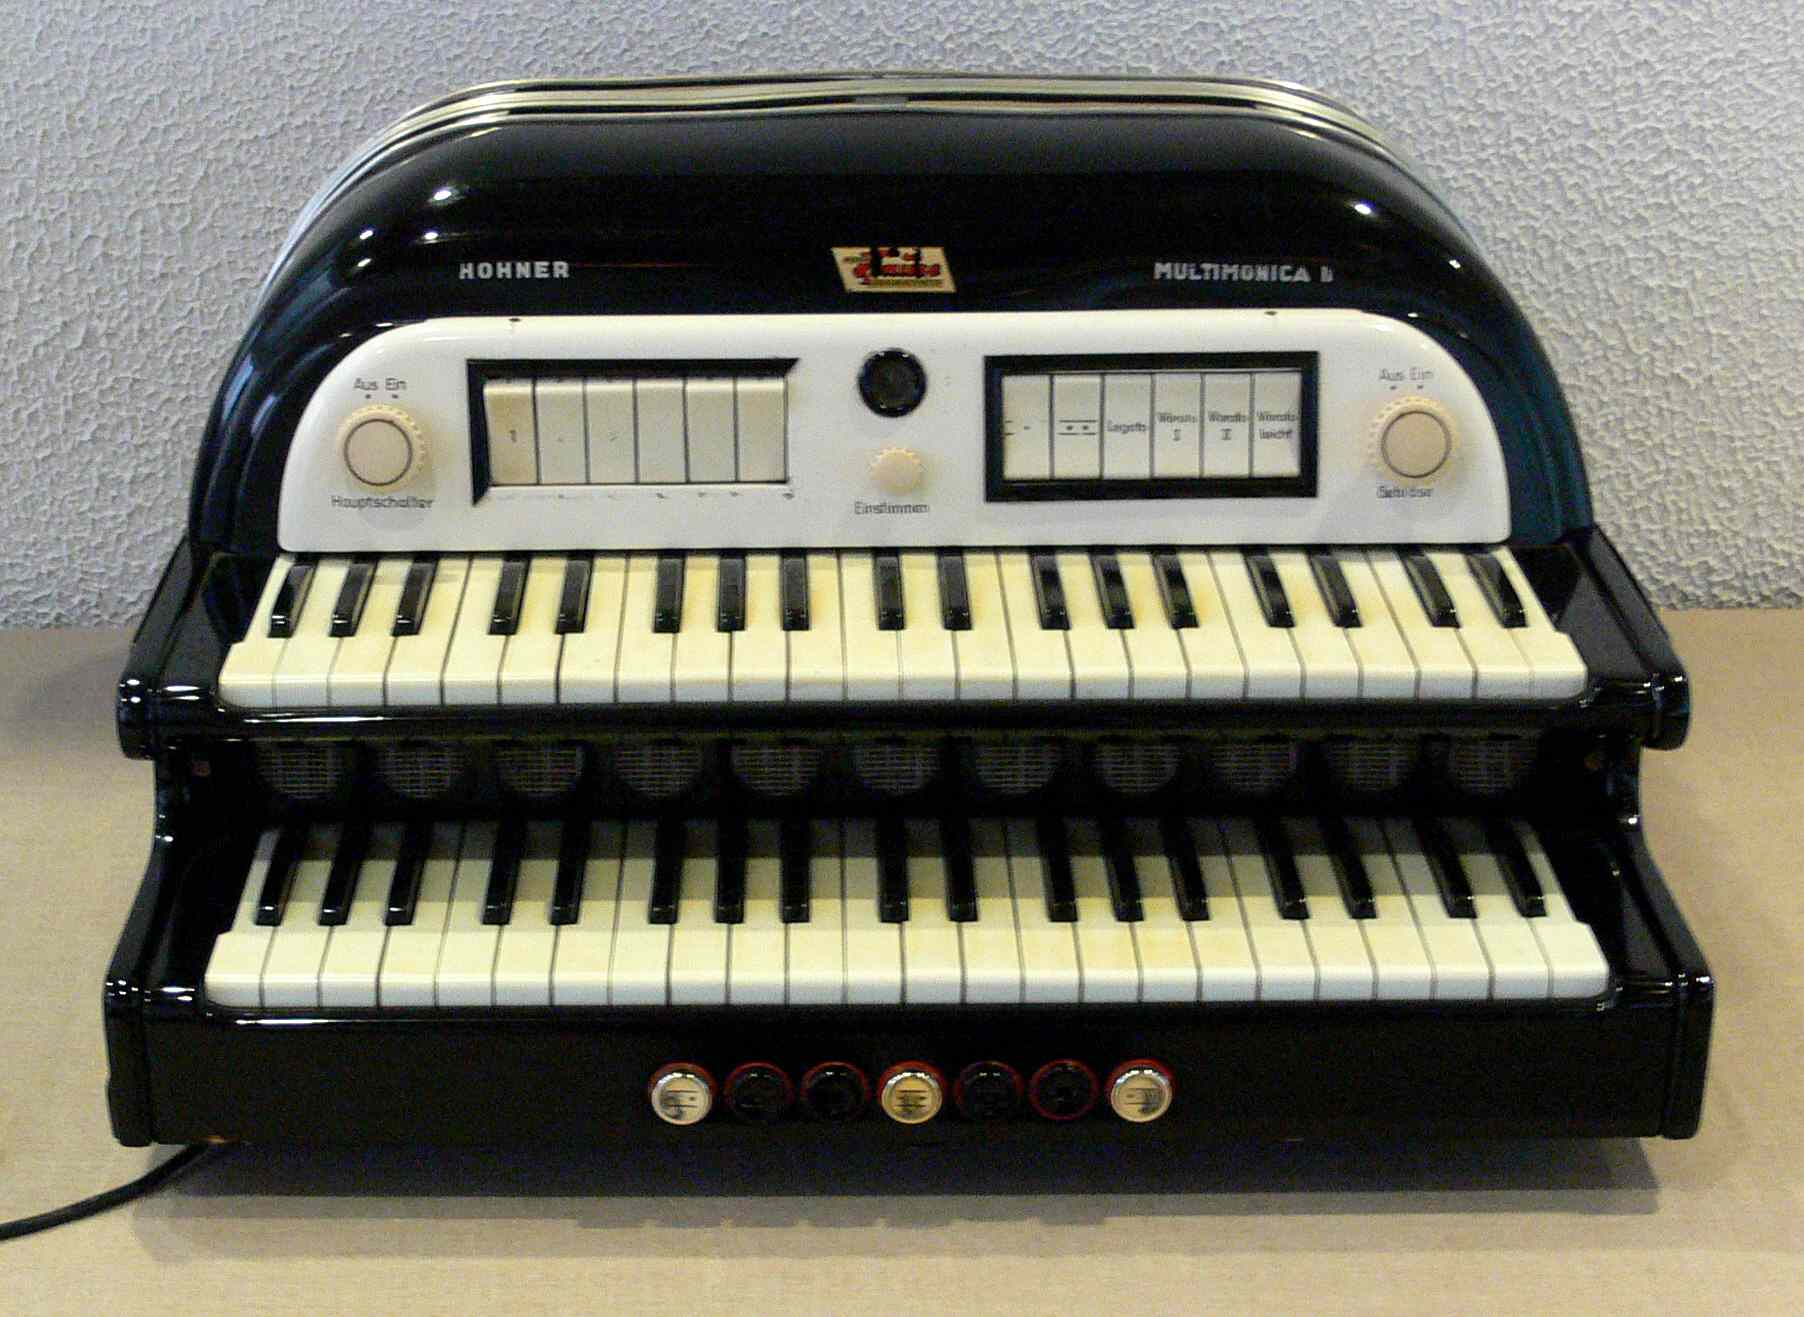 Harald Bode's Multimonica